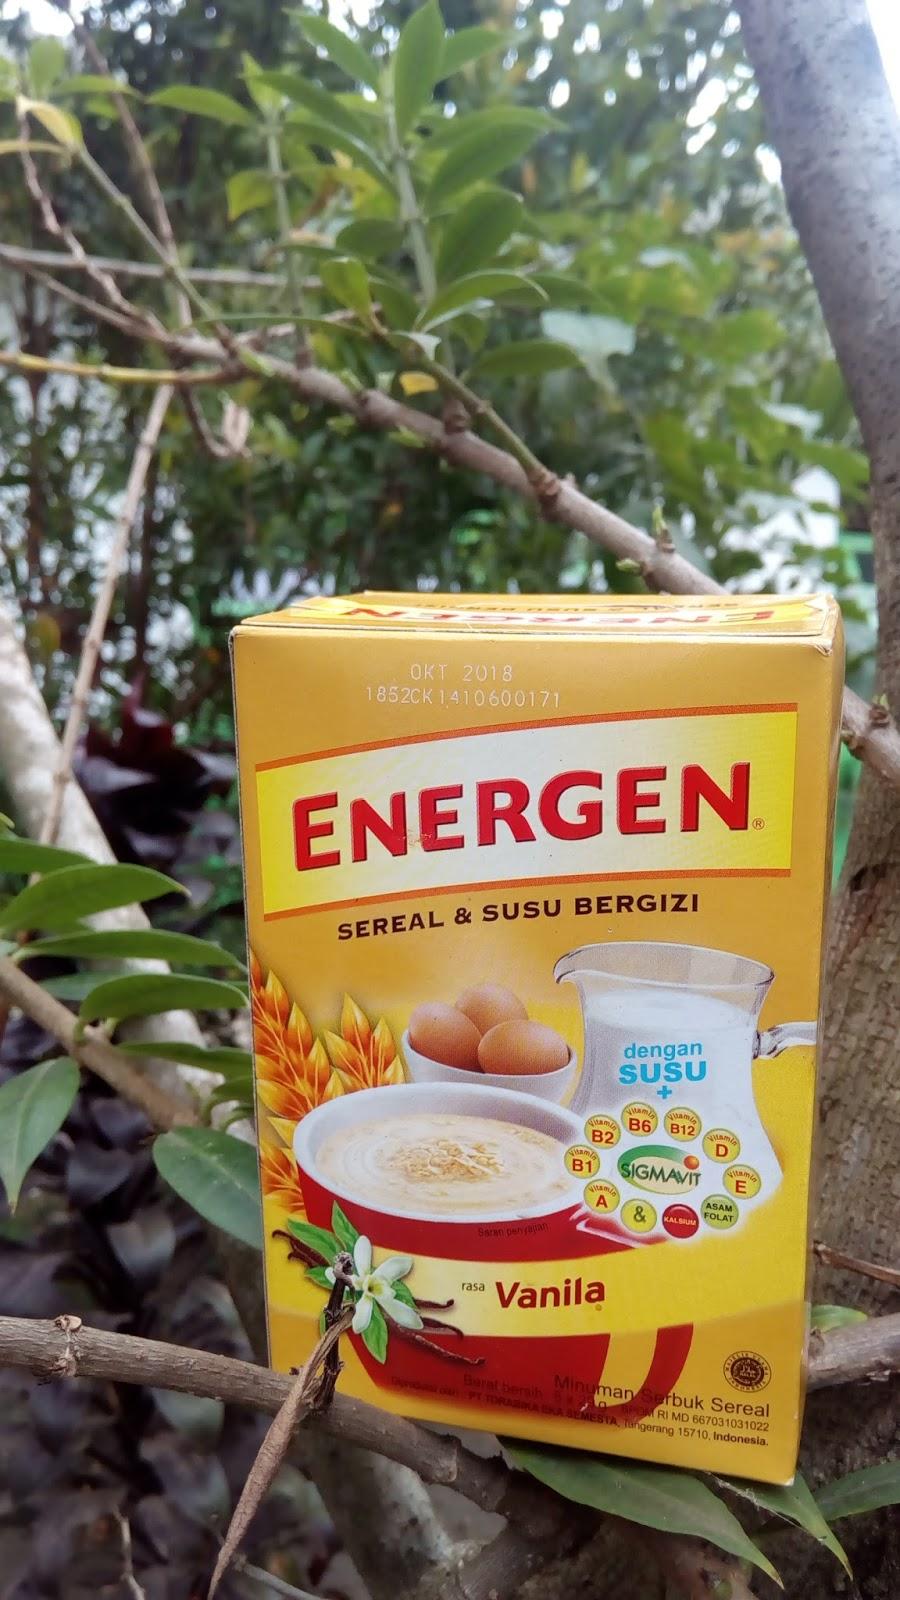 Manfaat Energen Sereal Untuk Diet